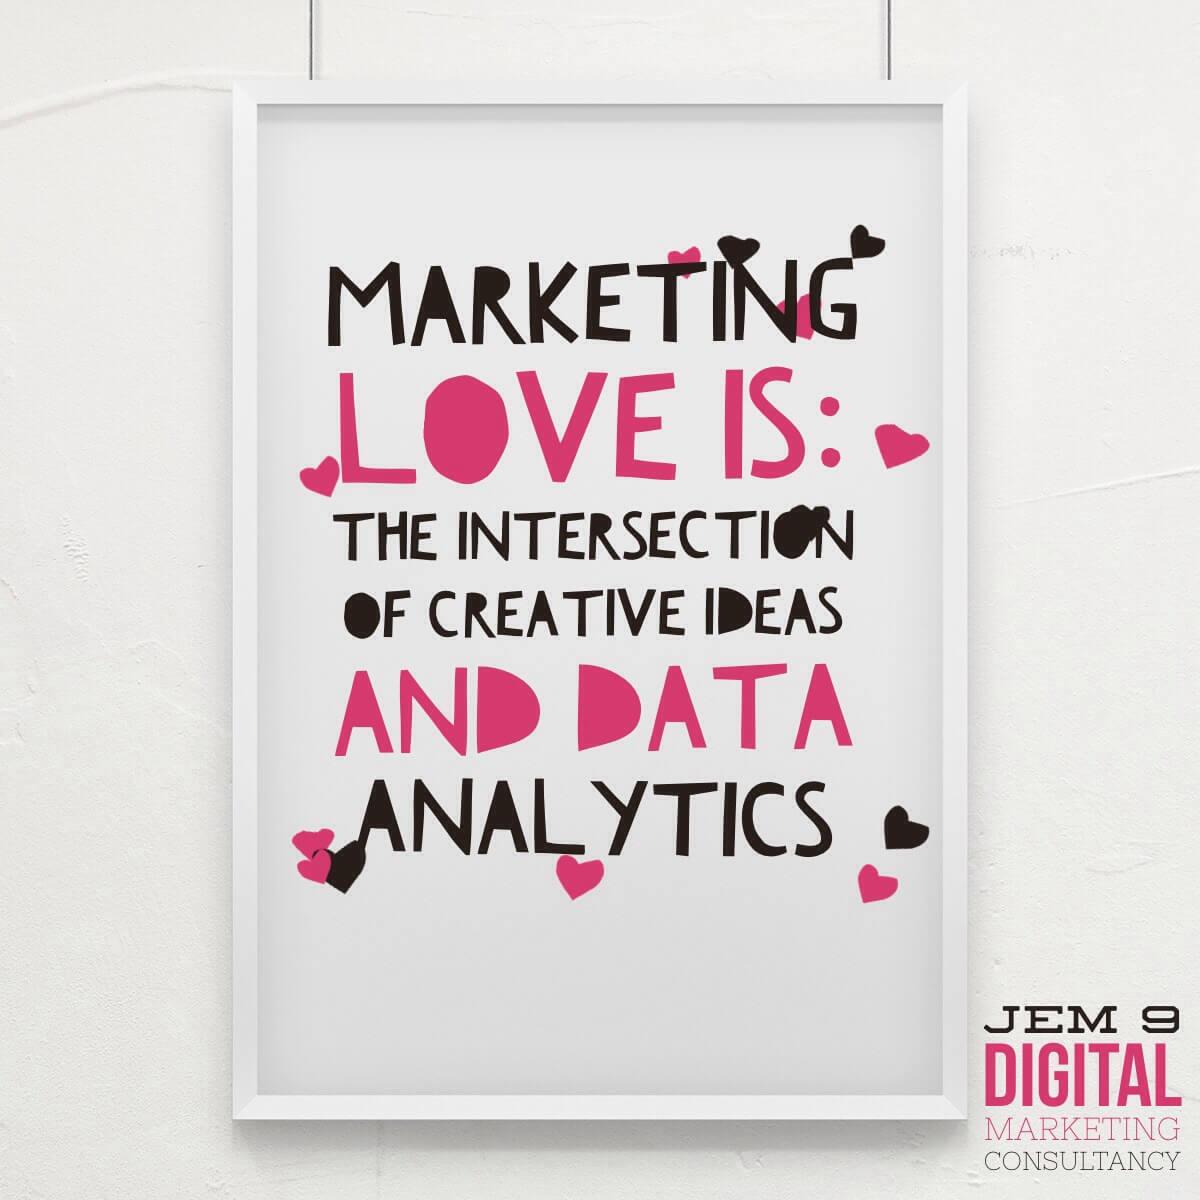 MarketingInspiration from JEM 9: marketing love is: the interaction of creative ideas with data analytics. Visit JEM9.com